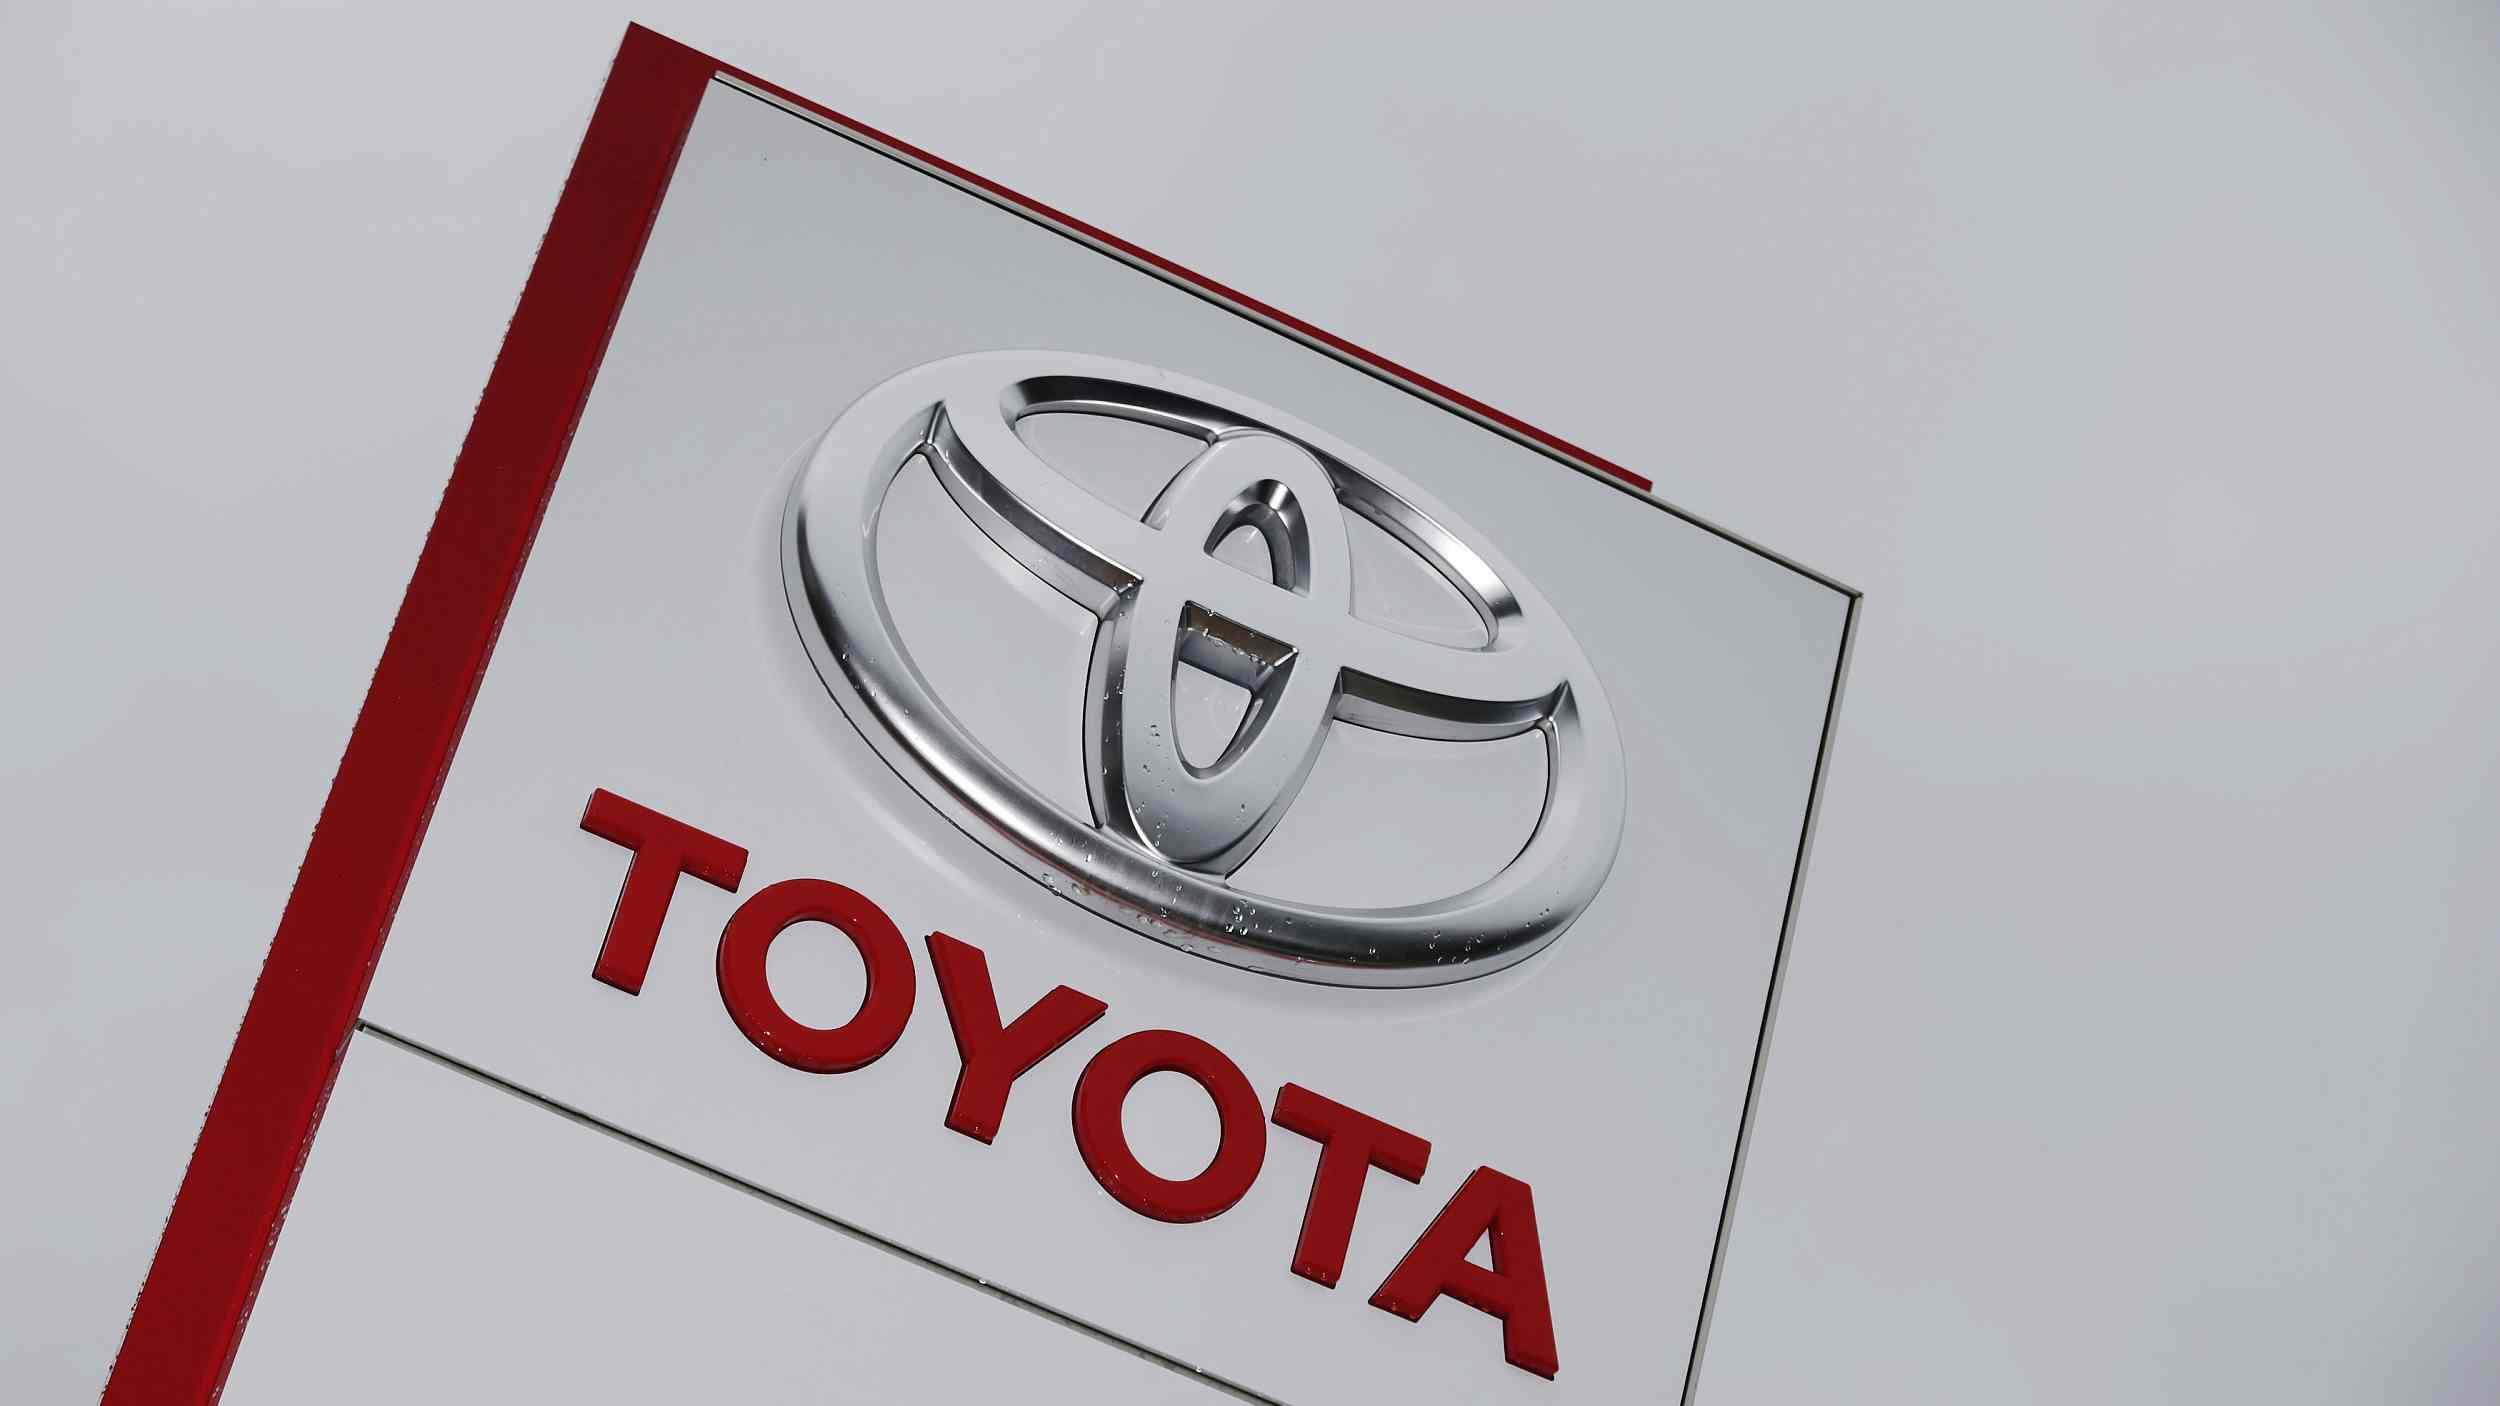 China recalls 186,790 Toyota defective compact cars